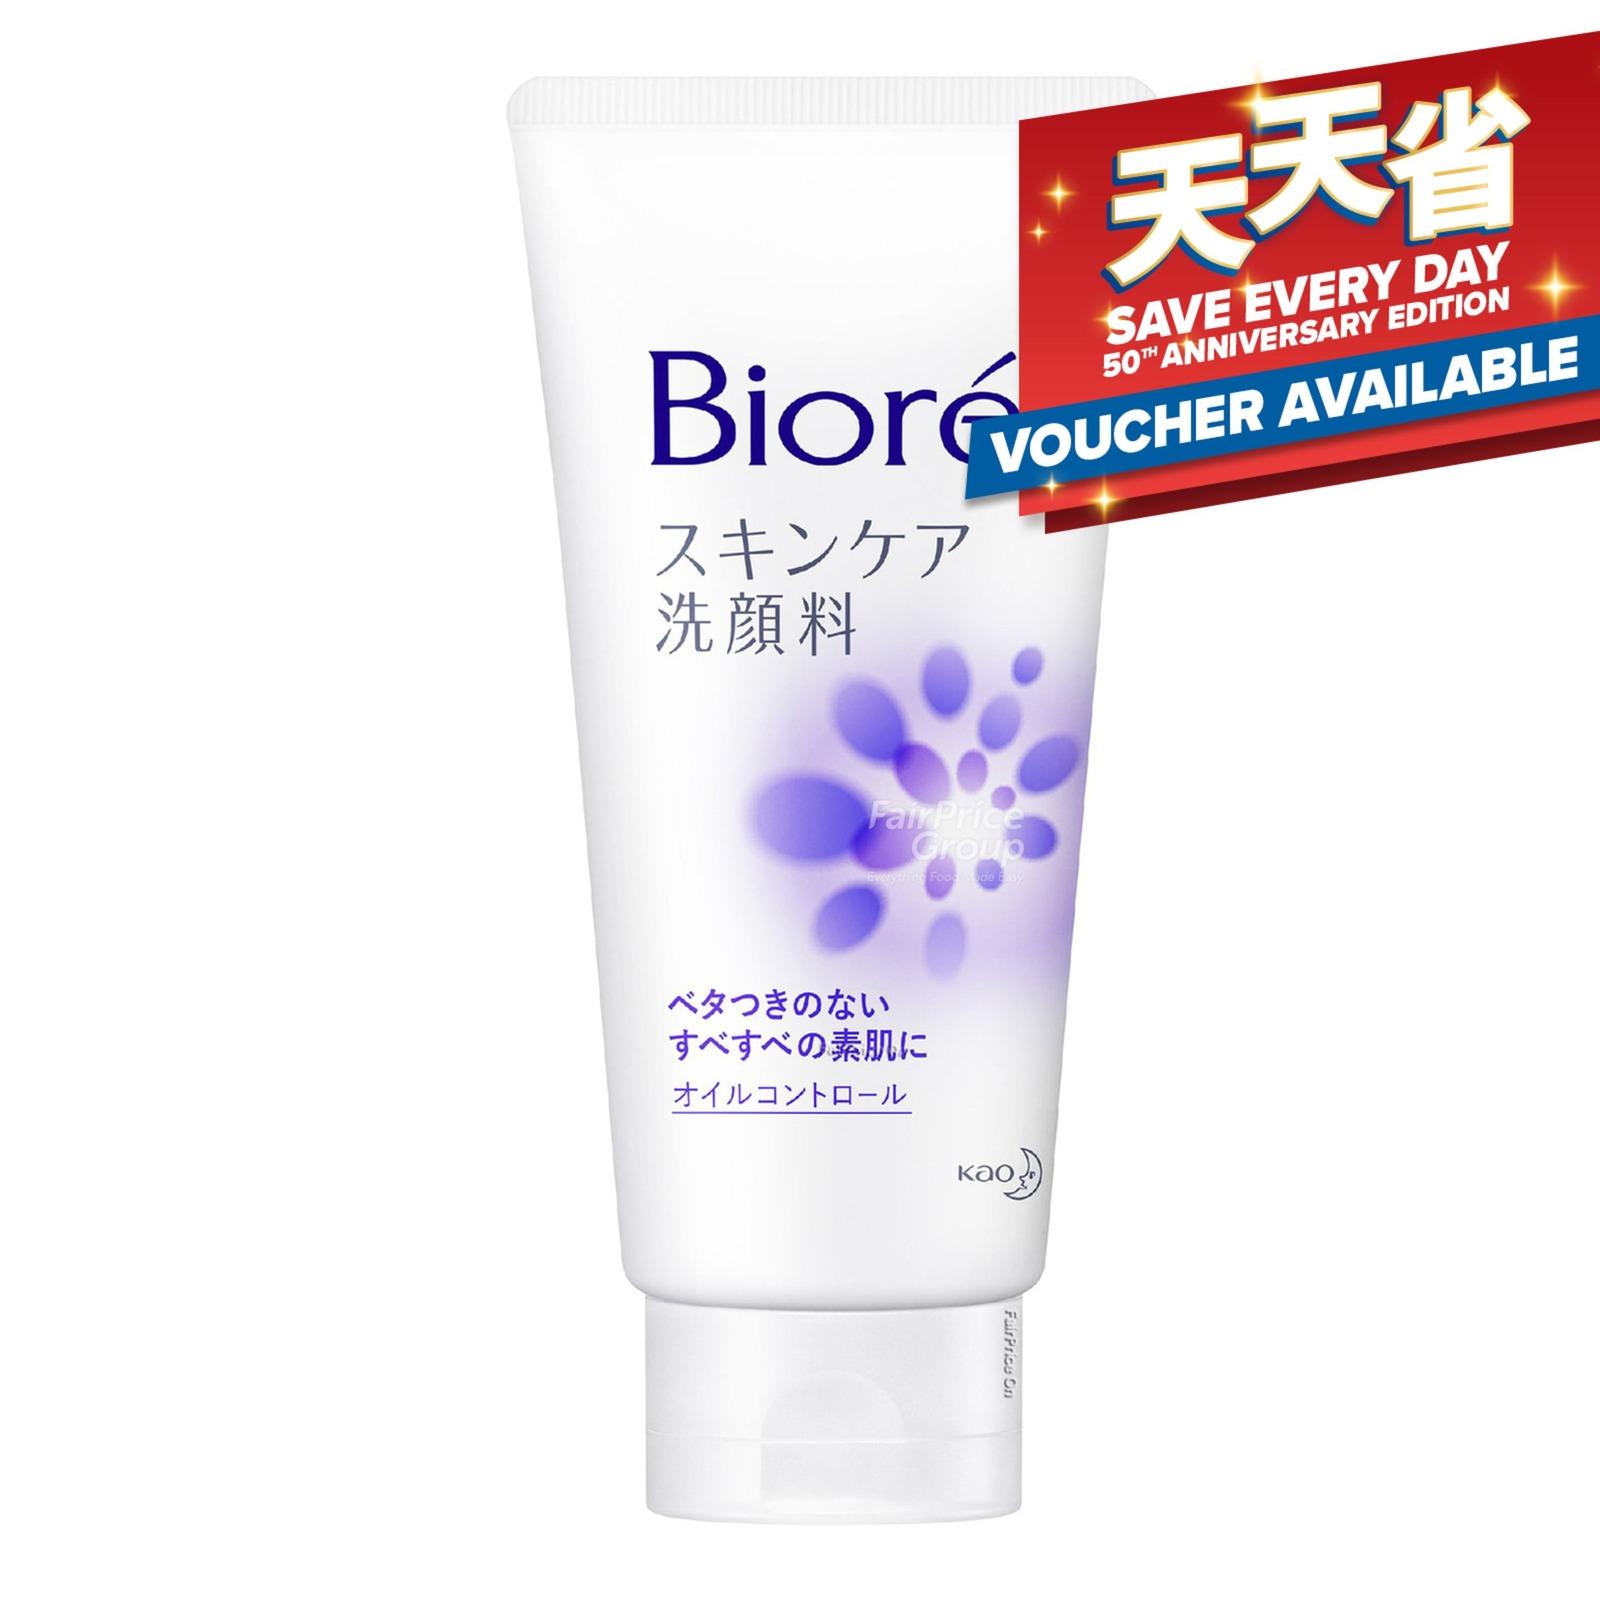 Biore Facial Foam Deep Clean, 130g